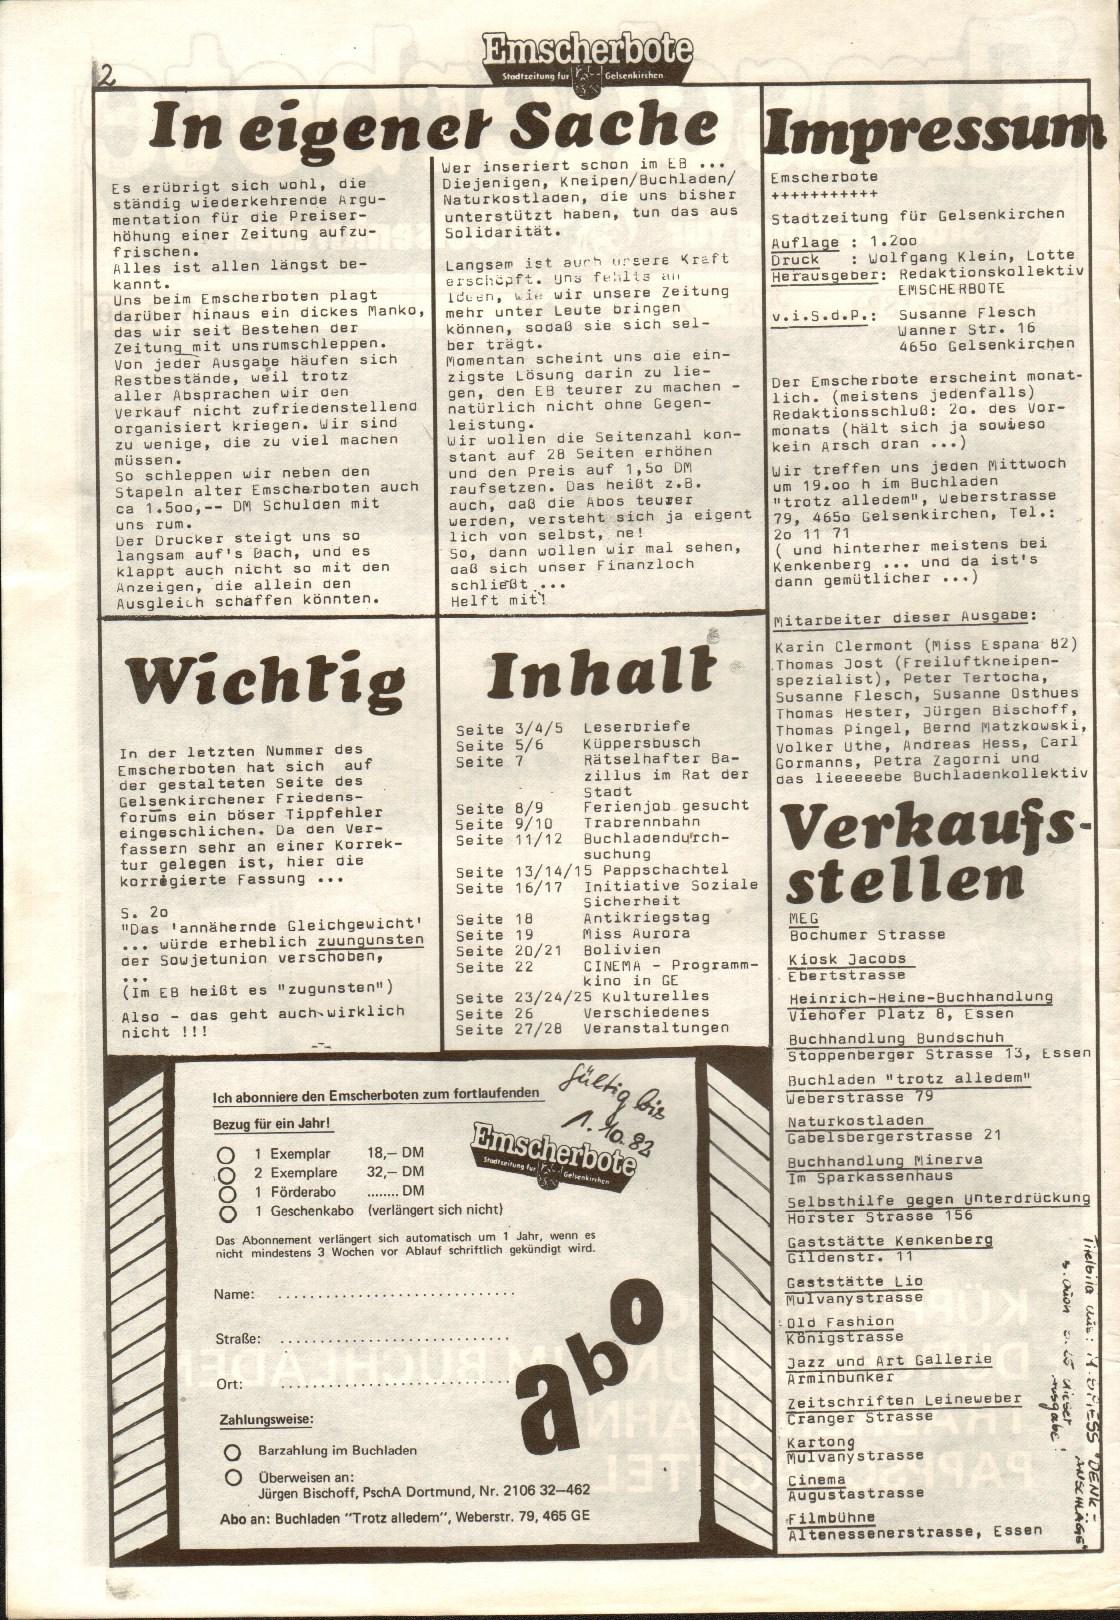 Gelsenkirchen_Emscherbote_1982_20_02